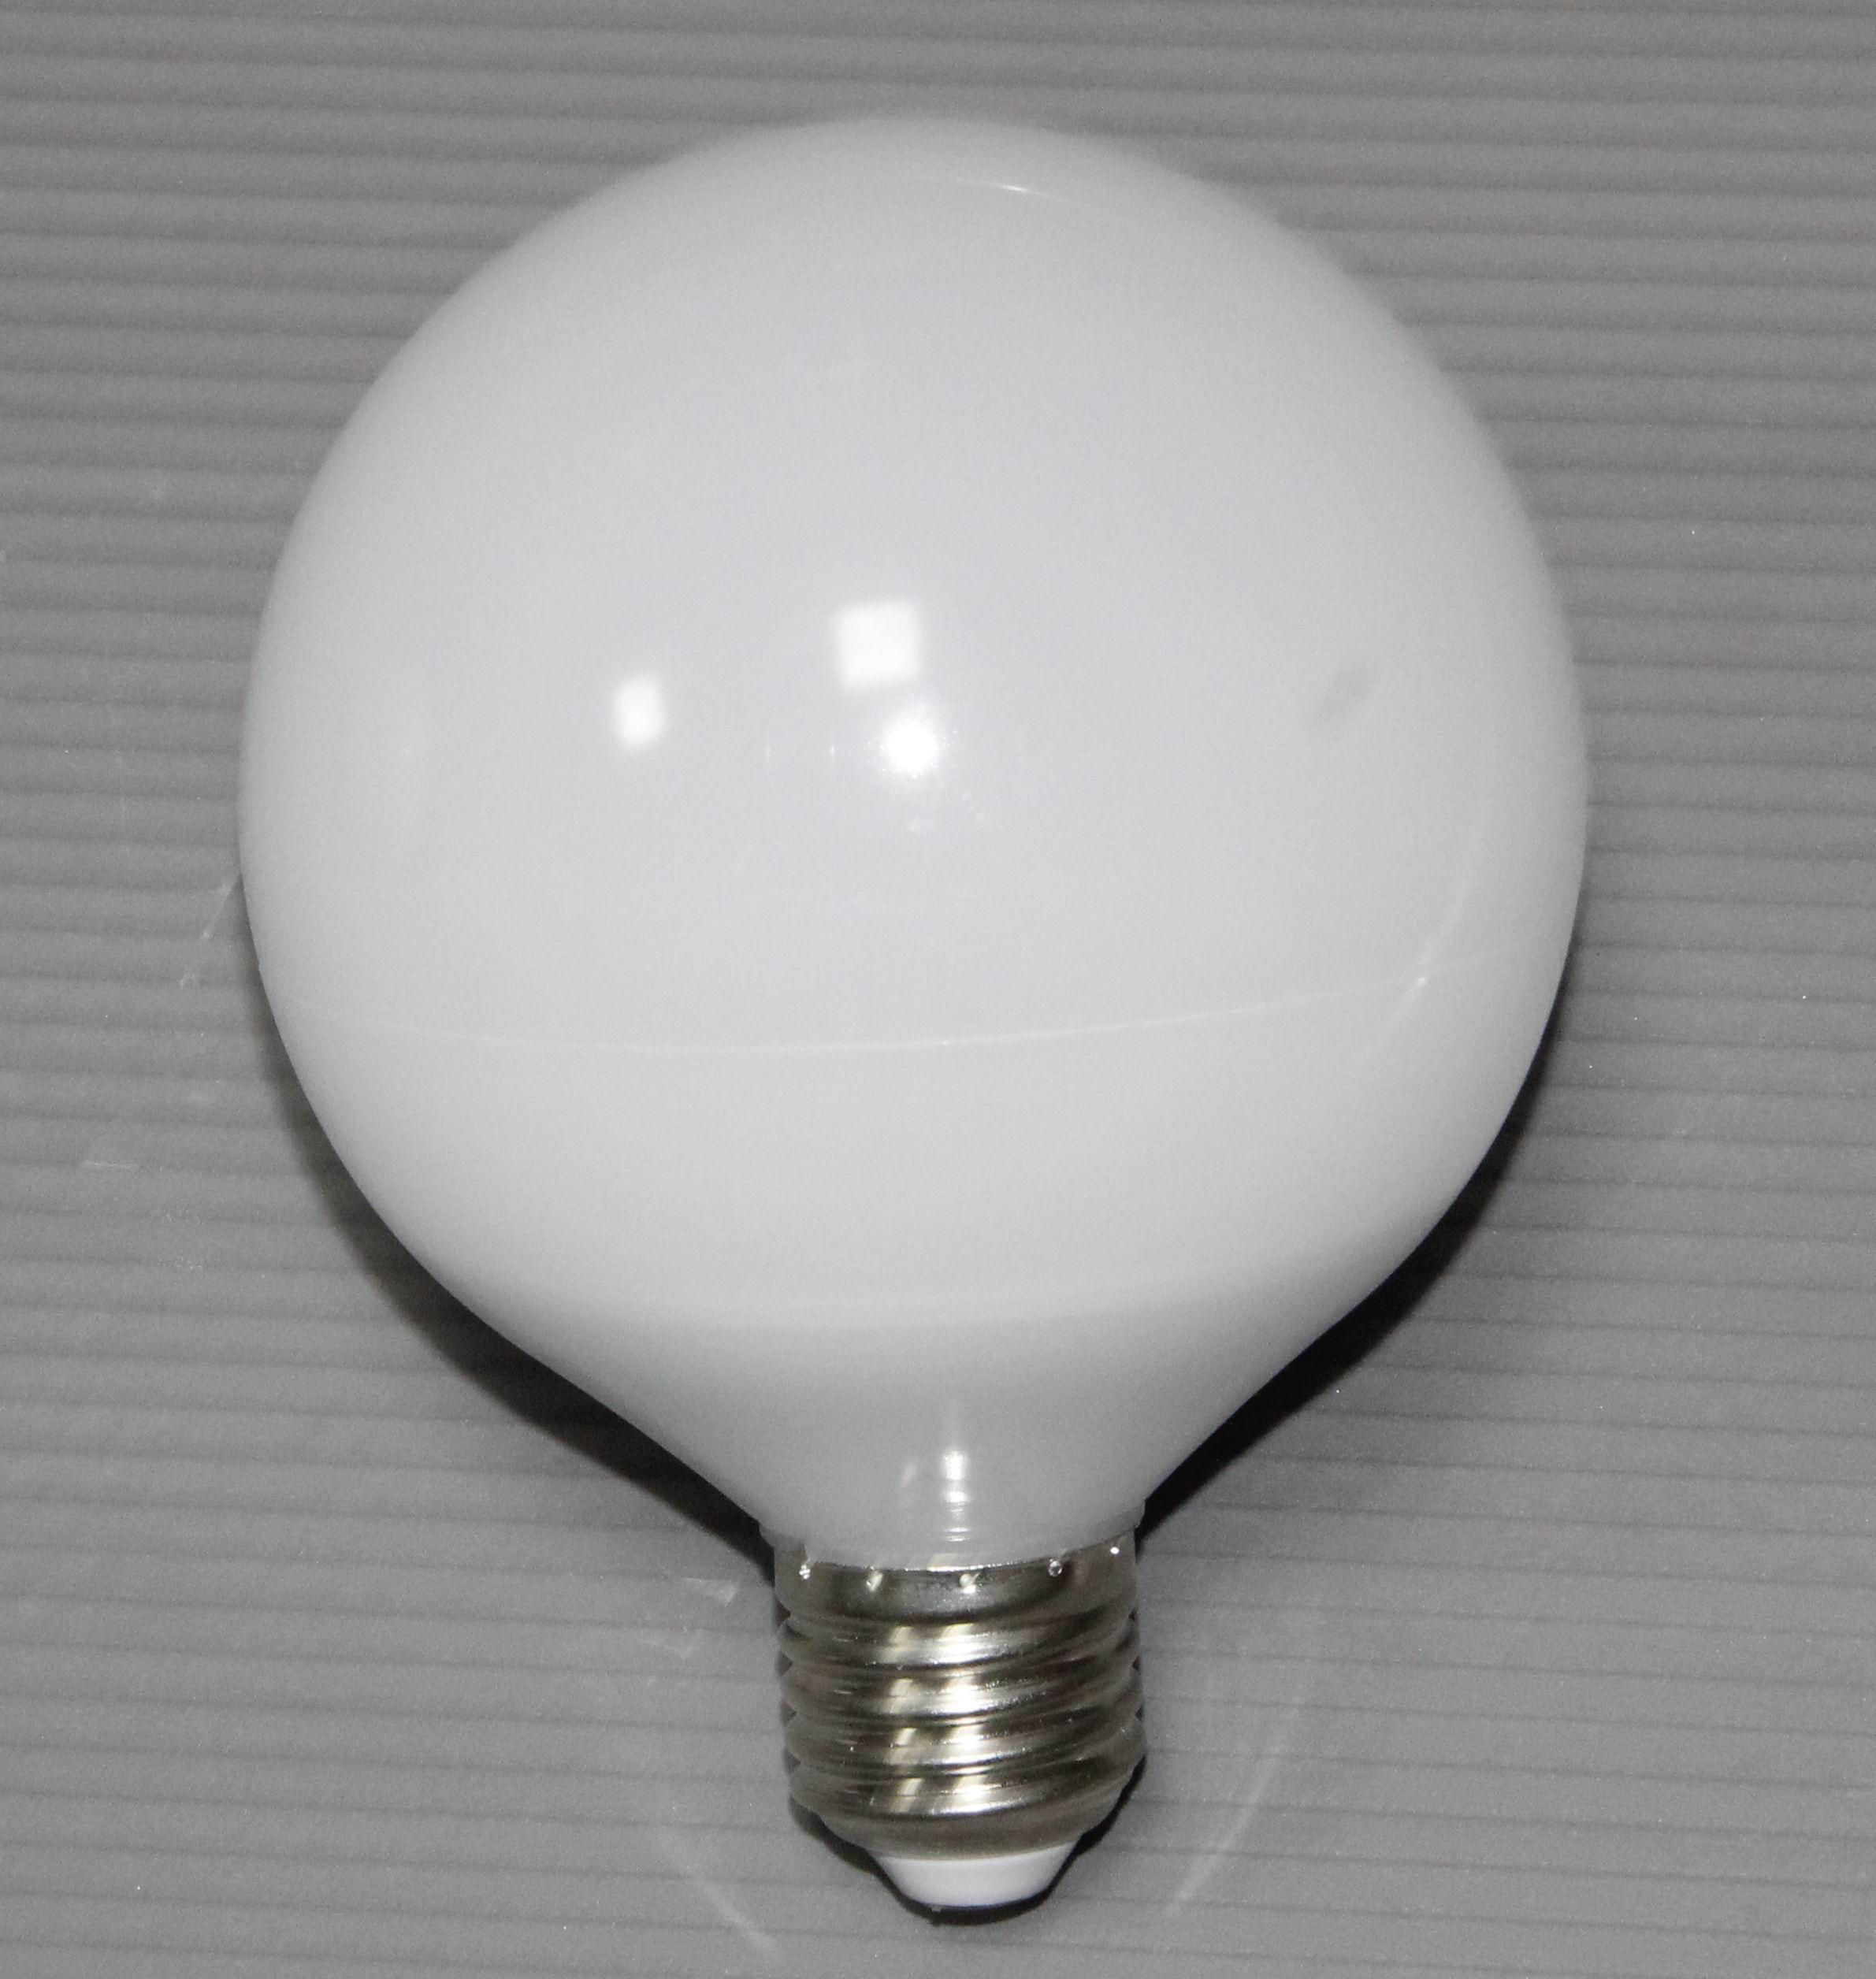 Super Bright Led Globe Bulb G90 12w G120 15w E27 Base High Light ...